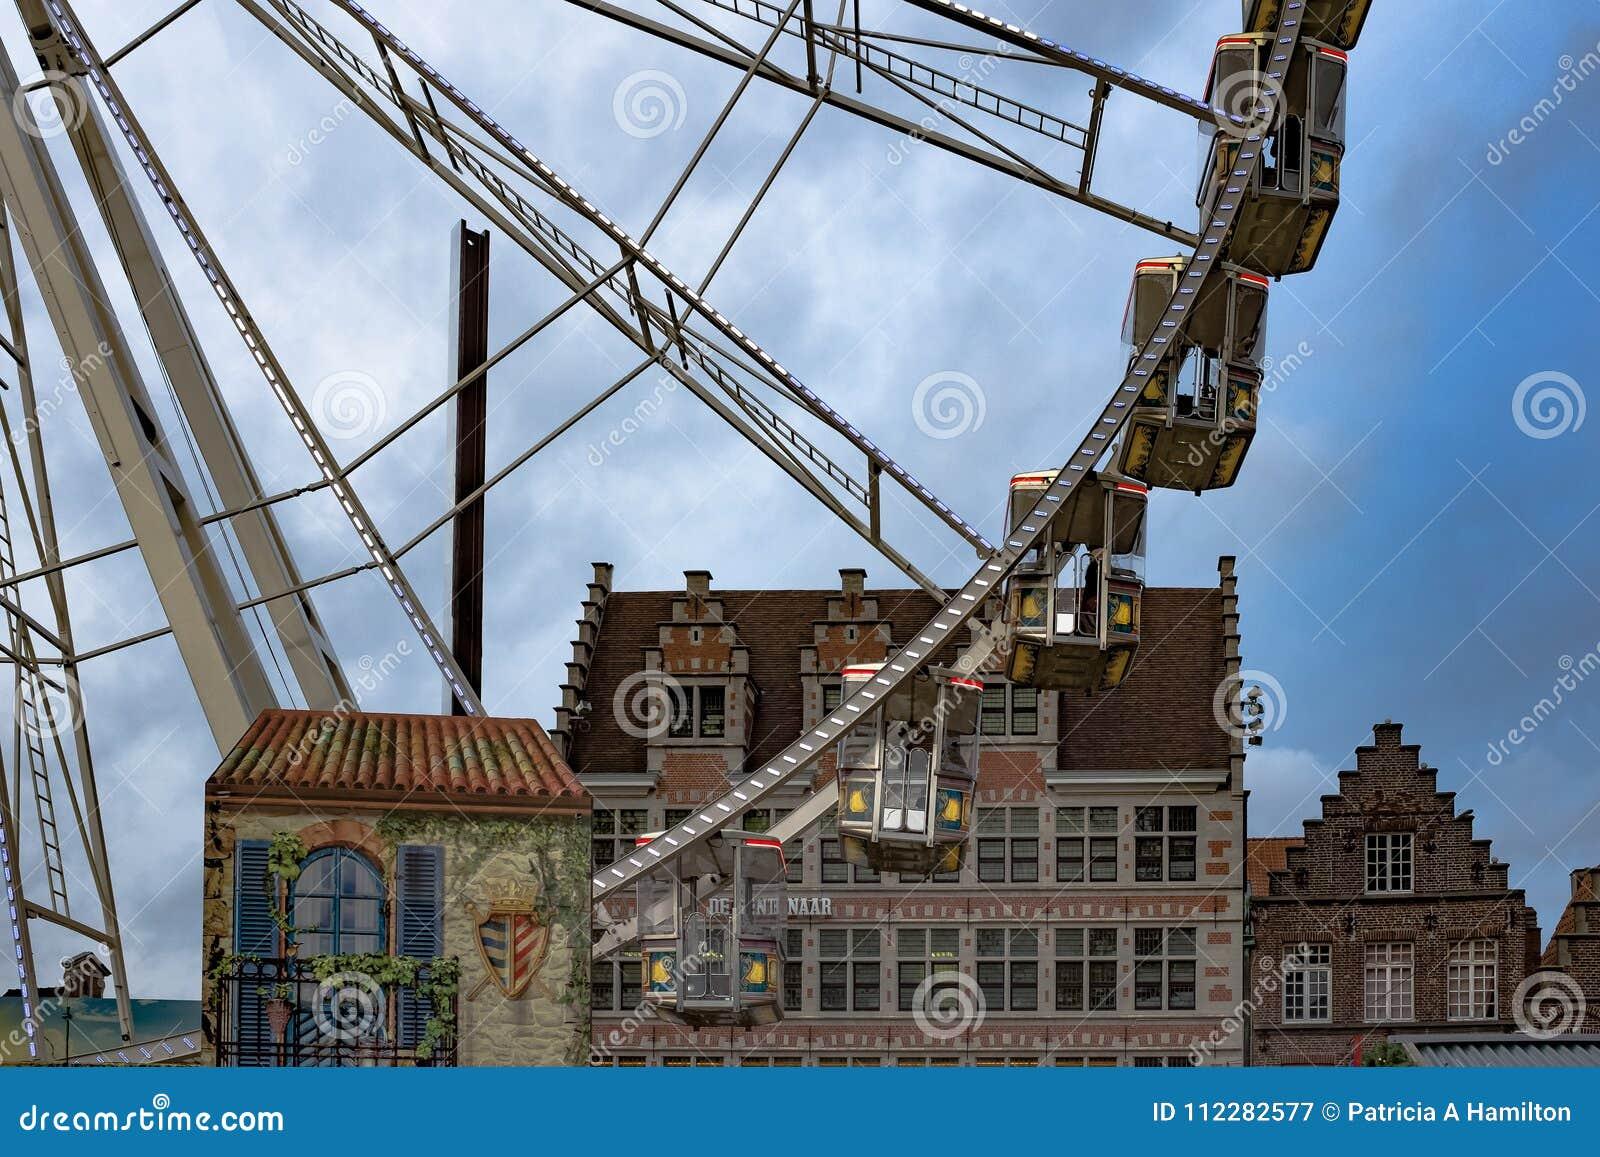 Hamilton Christmas Market.Ferris Wheel At Ghent Christmas Market Editorial Photography